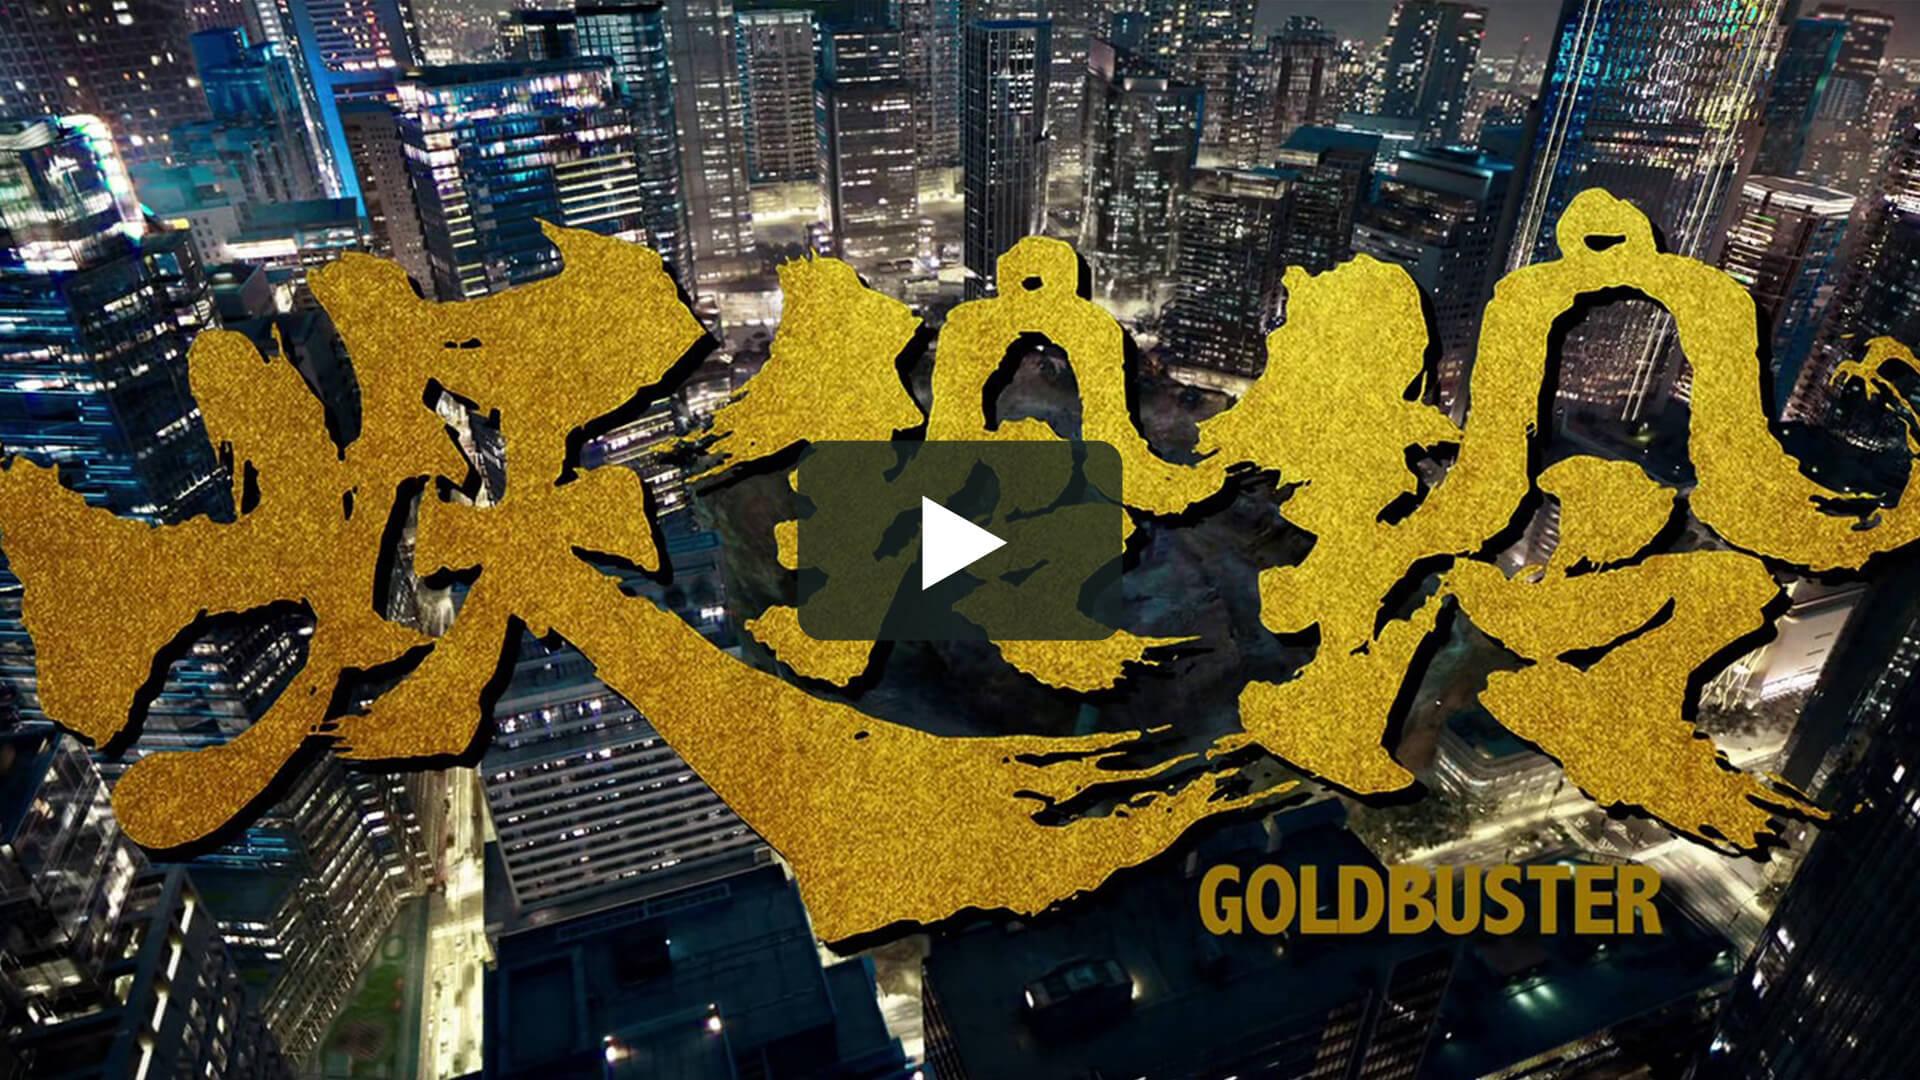 妖鈴鈴 - Goldbuster